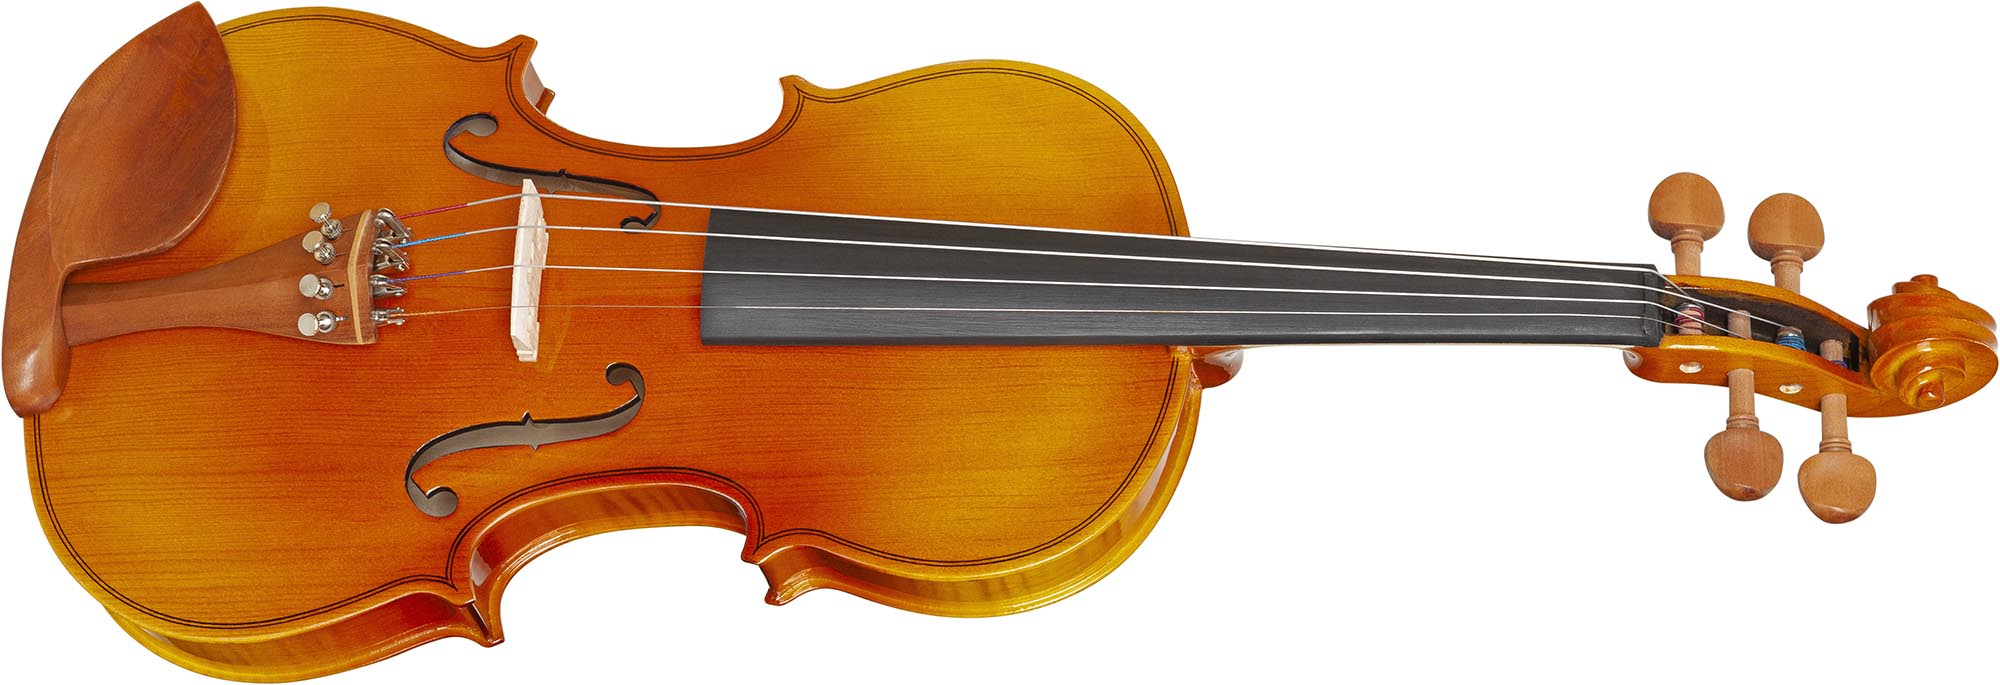 hve242 violino hofma visao frontal